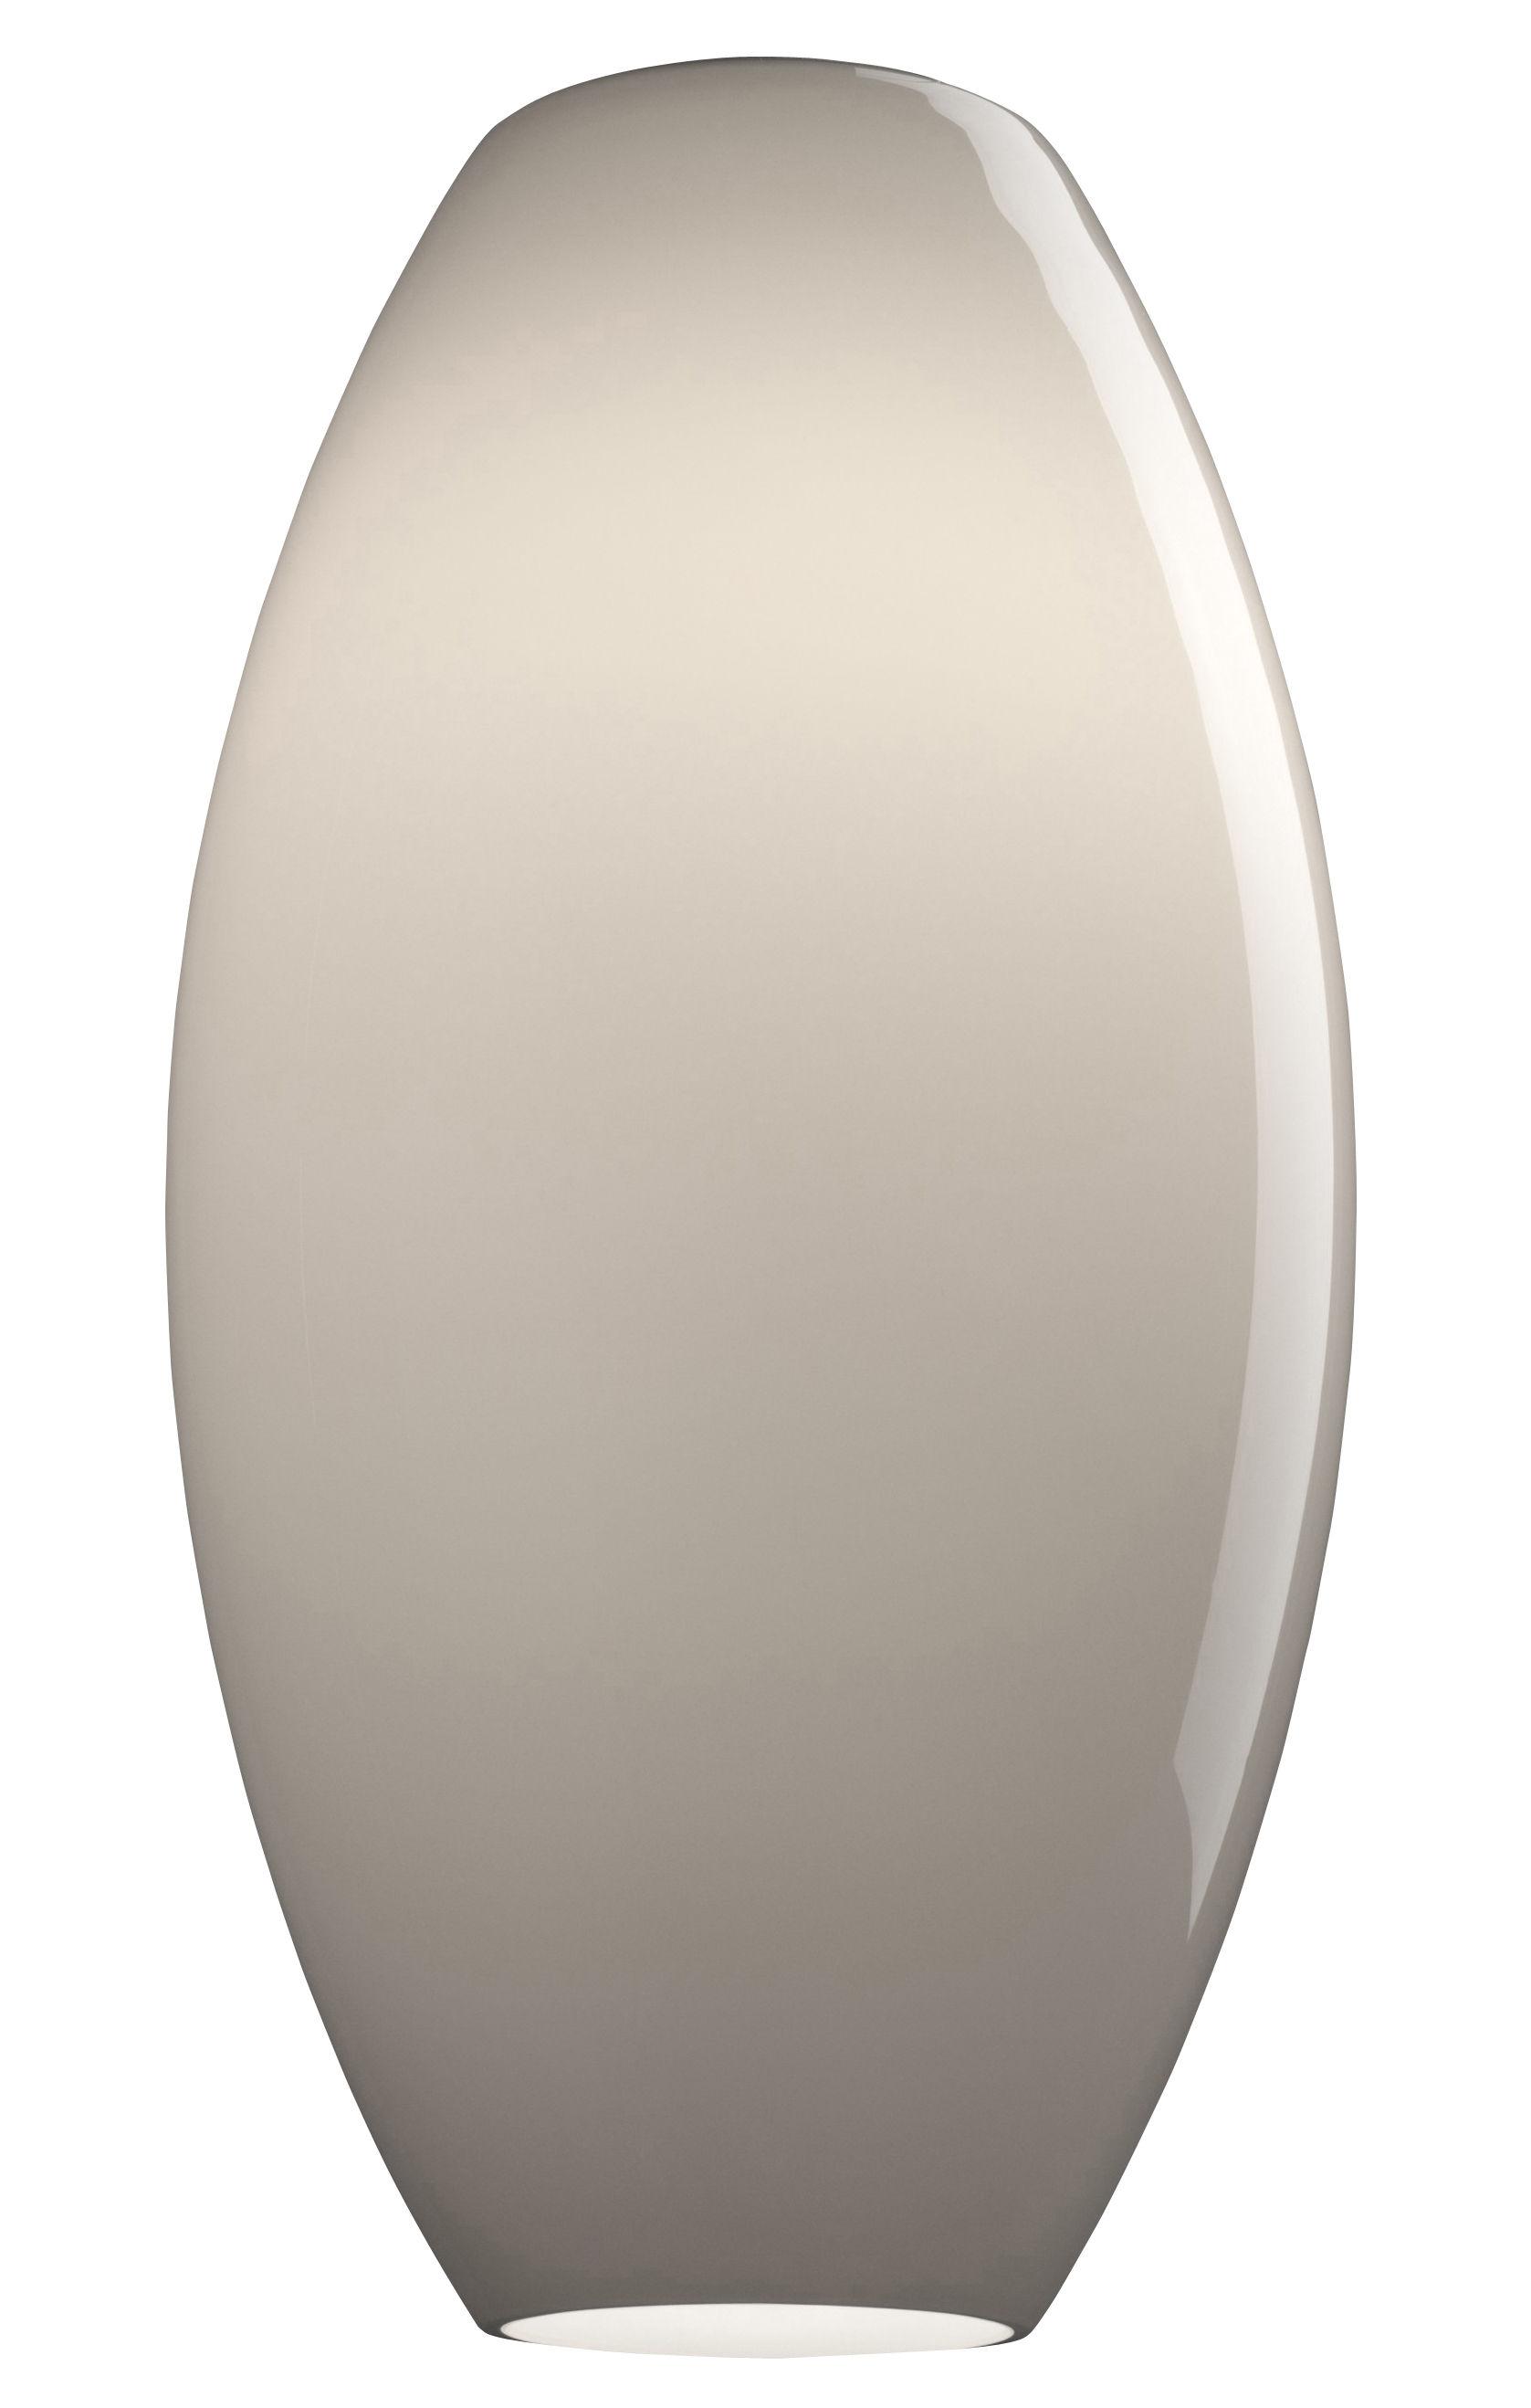 Luminaire - Suspensions - Suspension New Buds 1 / Verre artisanal - Ø 26 x H 49 cm - Foscarini - Gris - Verre soufflé